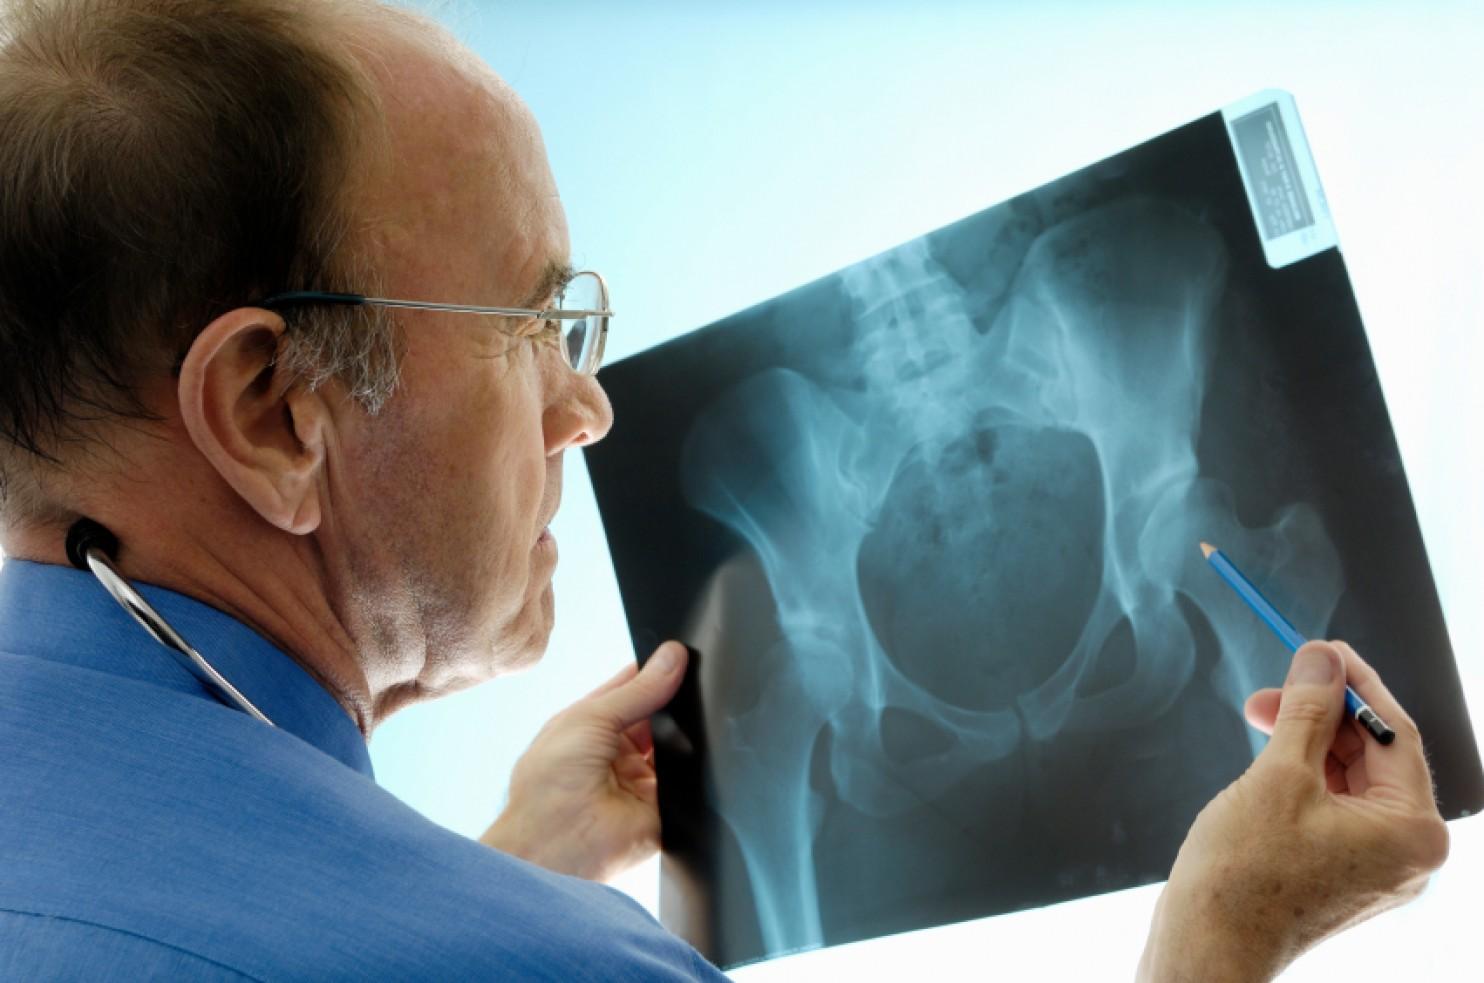 £17,000 compensation secured for hospital patient after broken hip was missed by doctors